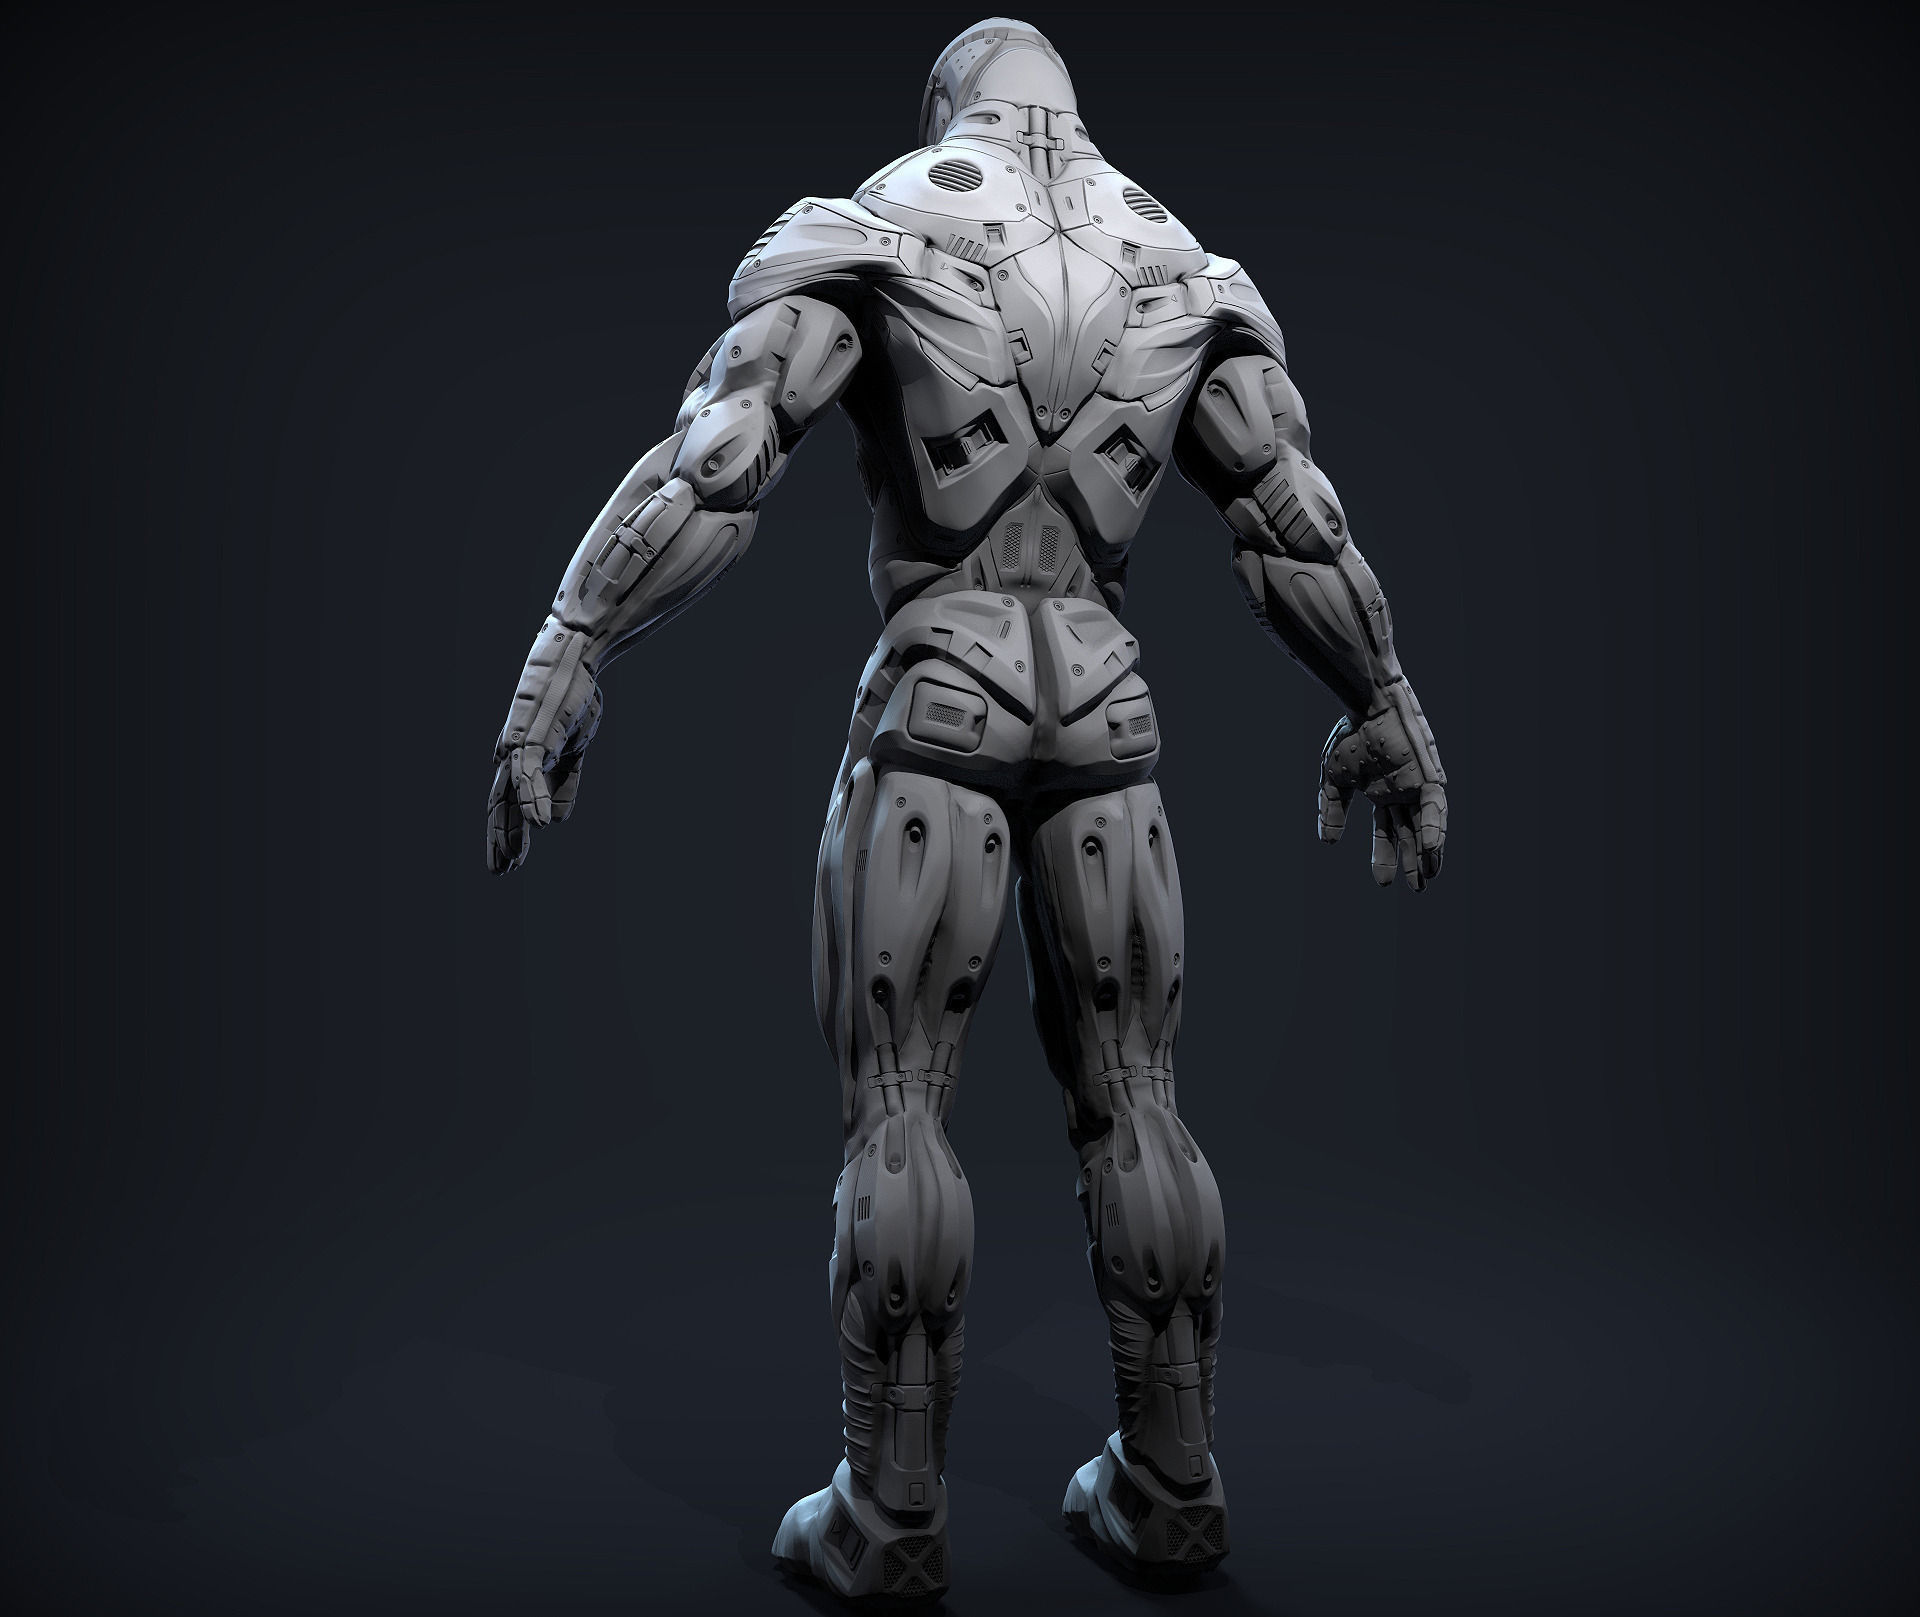 Mech Soldier 3D Model .obj - CGTrader.com | Armor concept